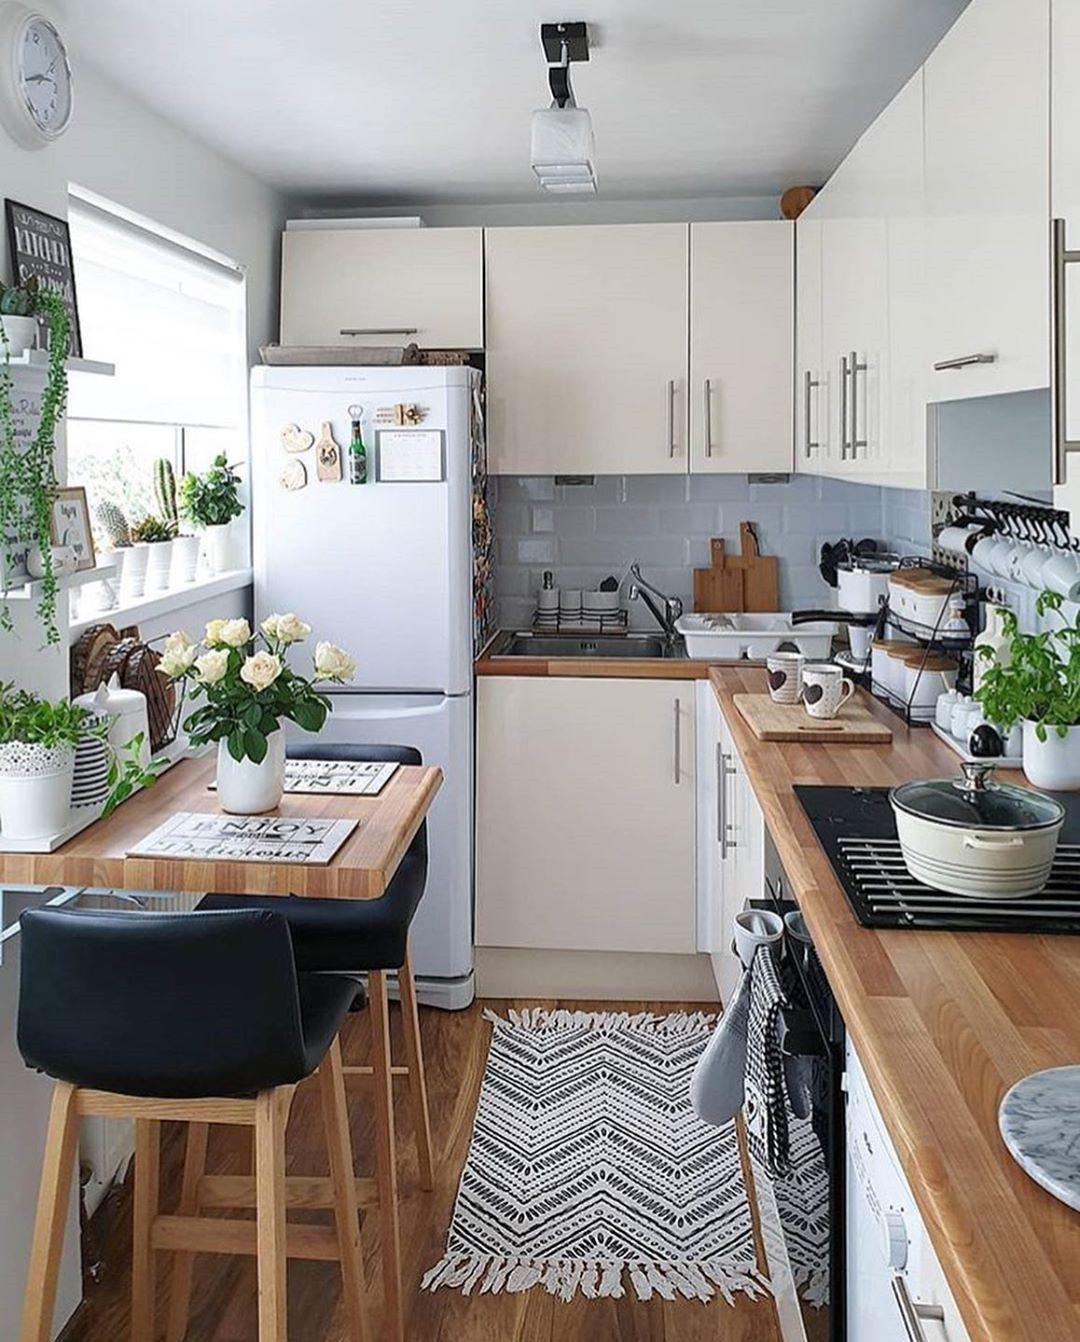 60 Creative Small Kitchen Design And Organization Ideas ...